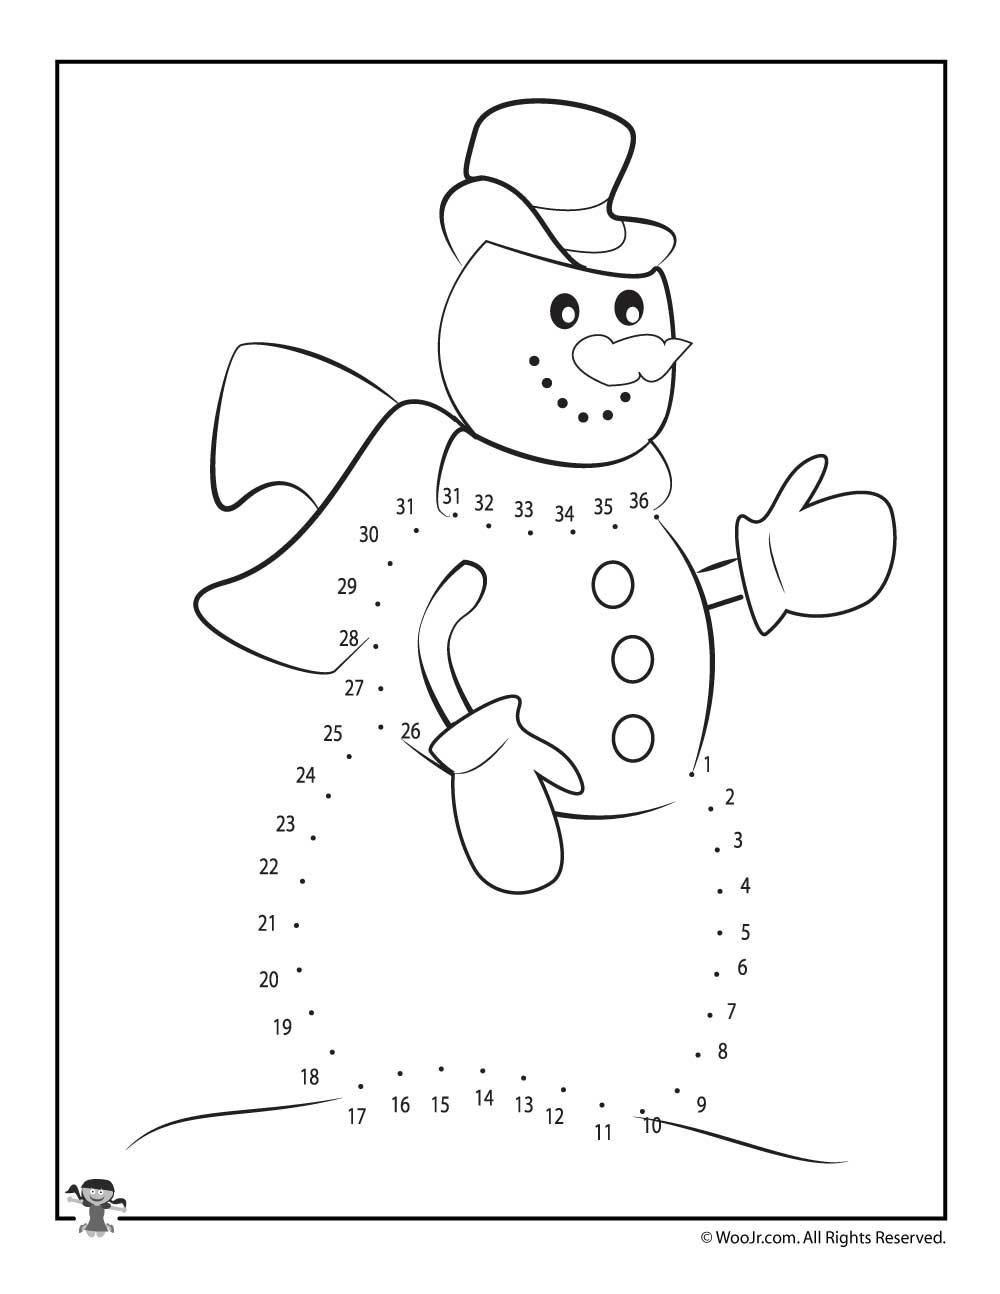 Winter Dot To Dot Printable Worksheets : Winter snowman dot to printable woo jr kids activities